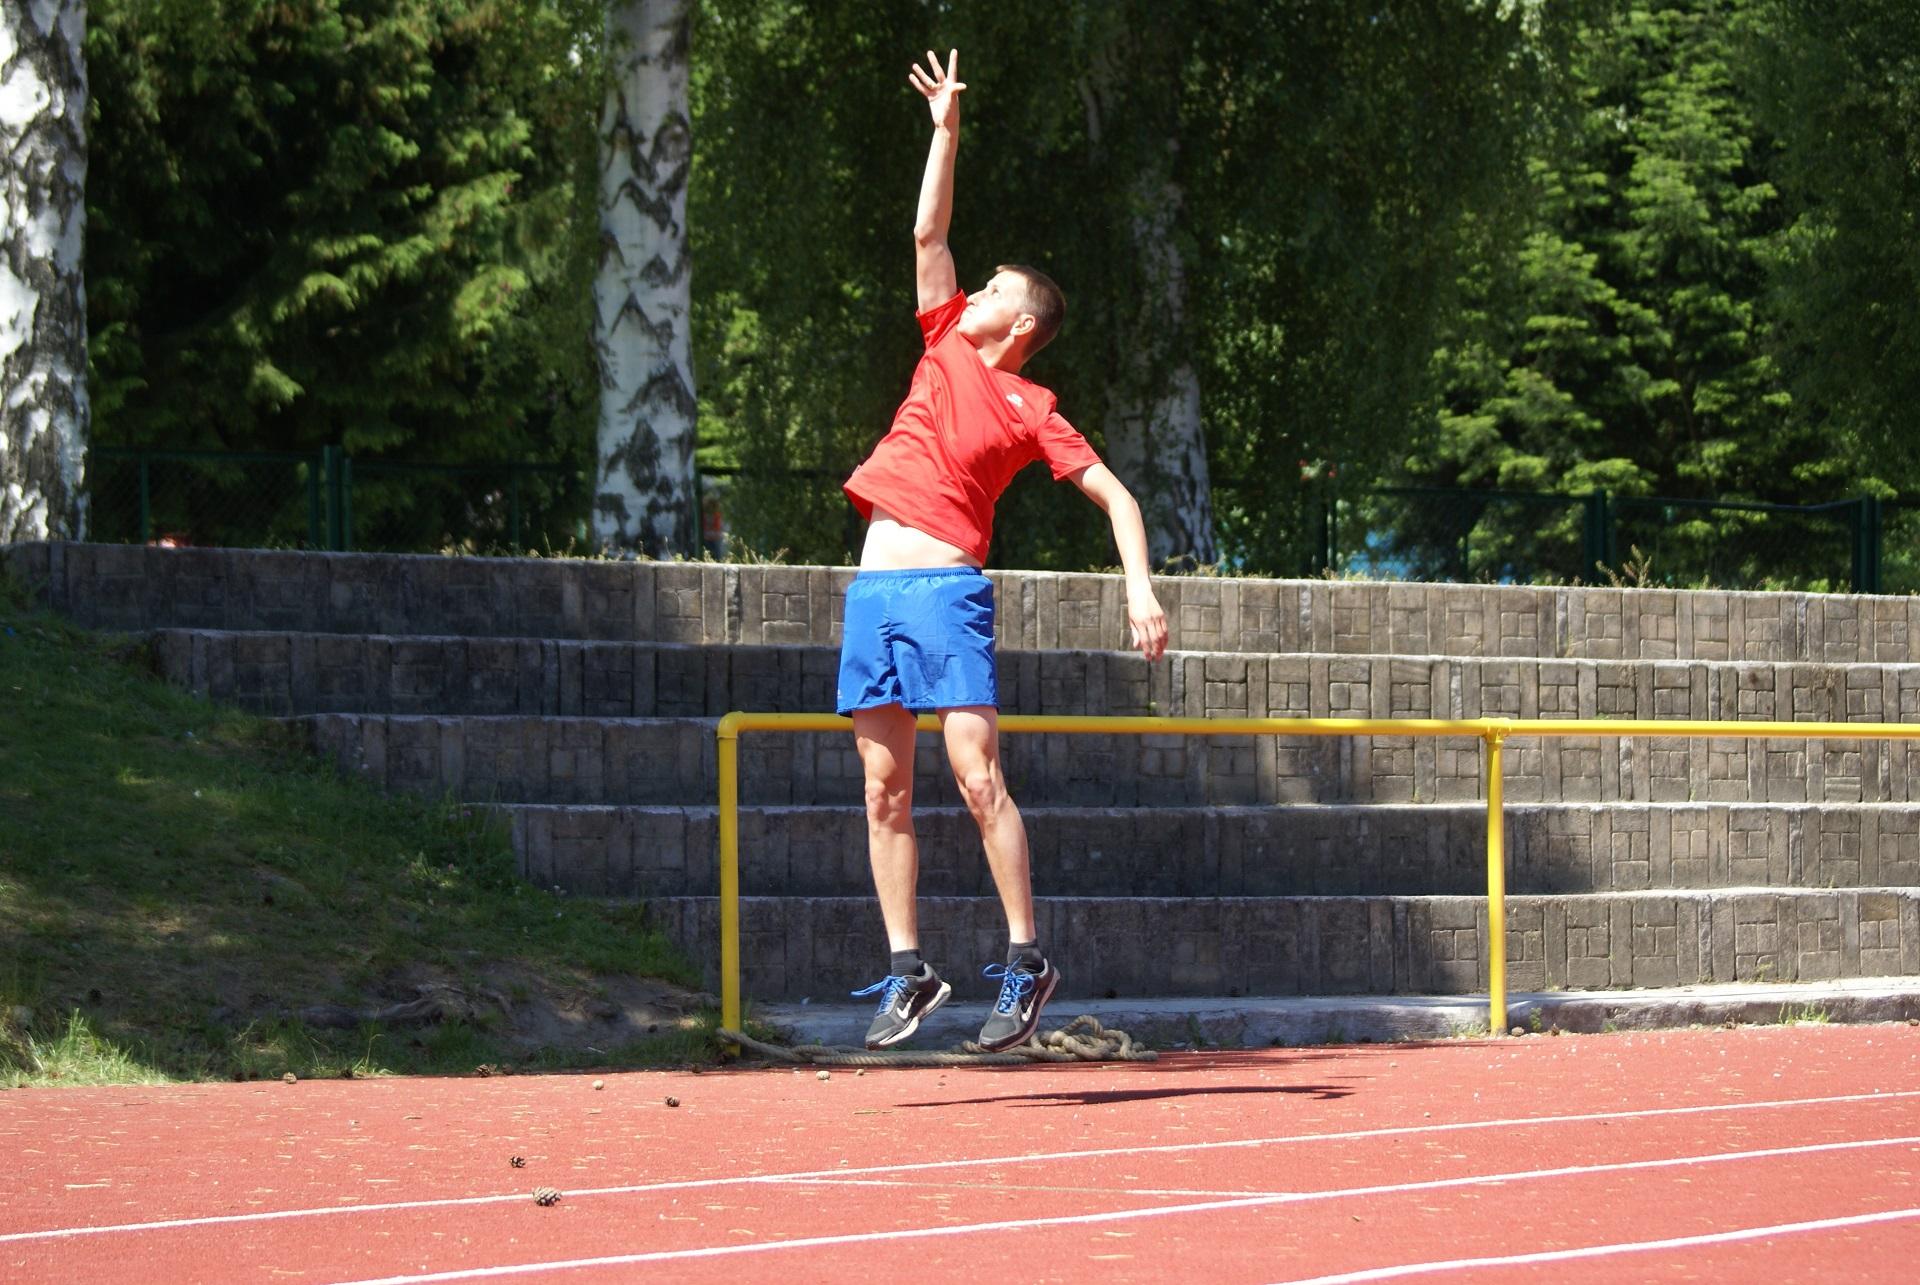 Trener Michał Woś